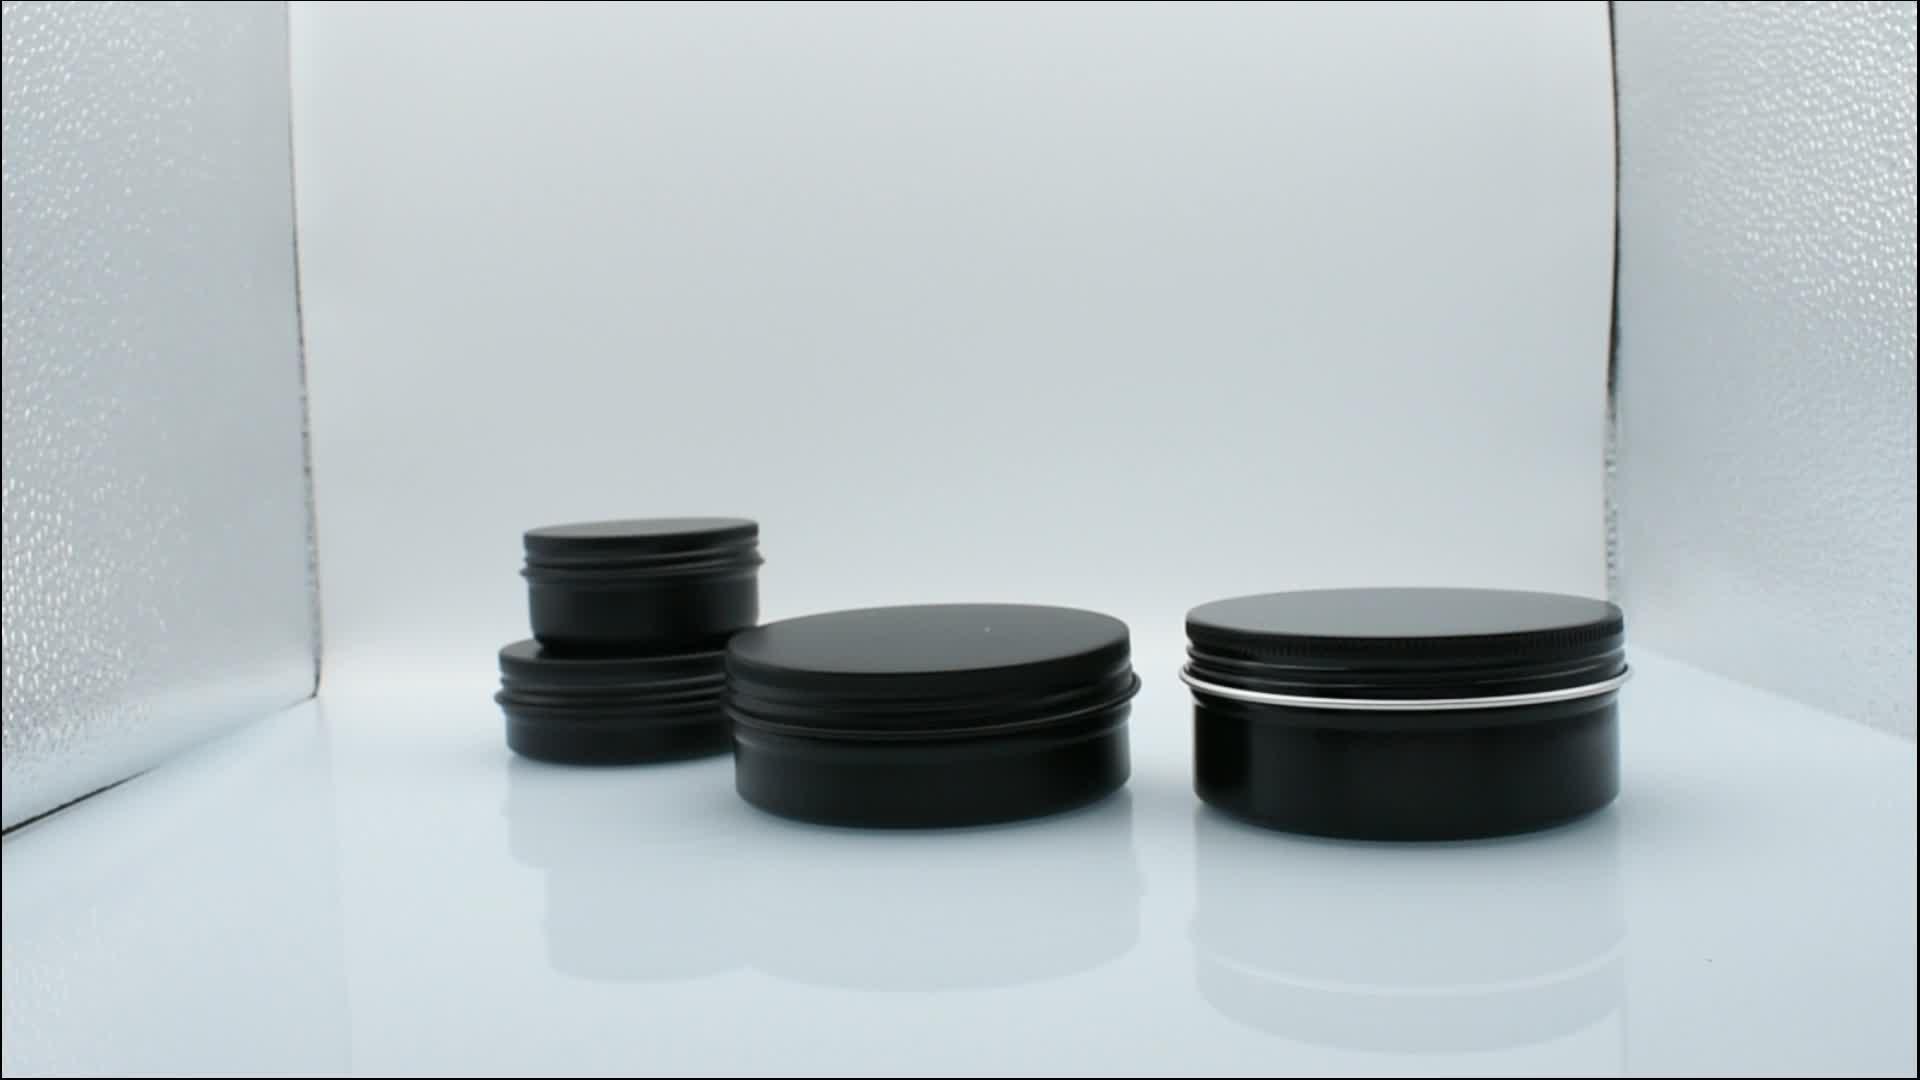 China leverancier 15 ml 30 ml tin kan aluminium 50 ml 60 ml 100 ml 150 ml aluminium tin box 15g 30g 50g 60g 100g 150g aluminium tin potten